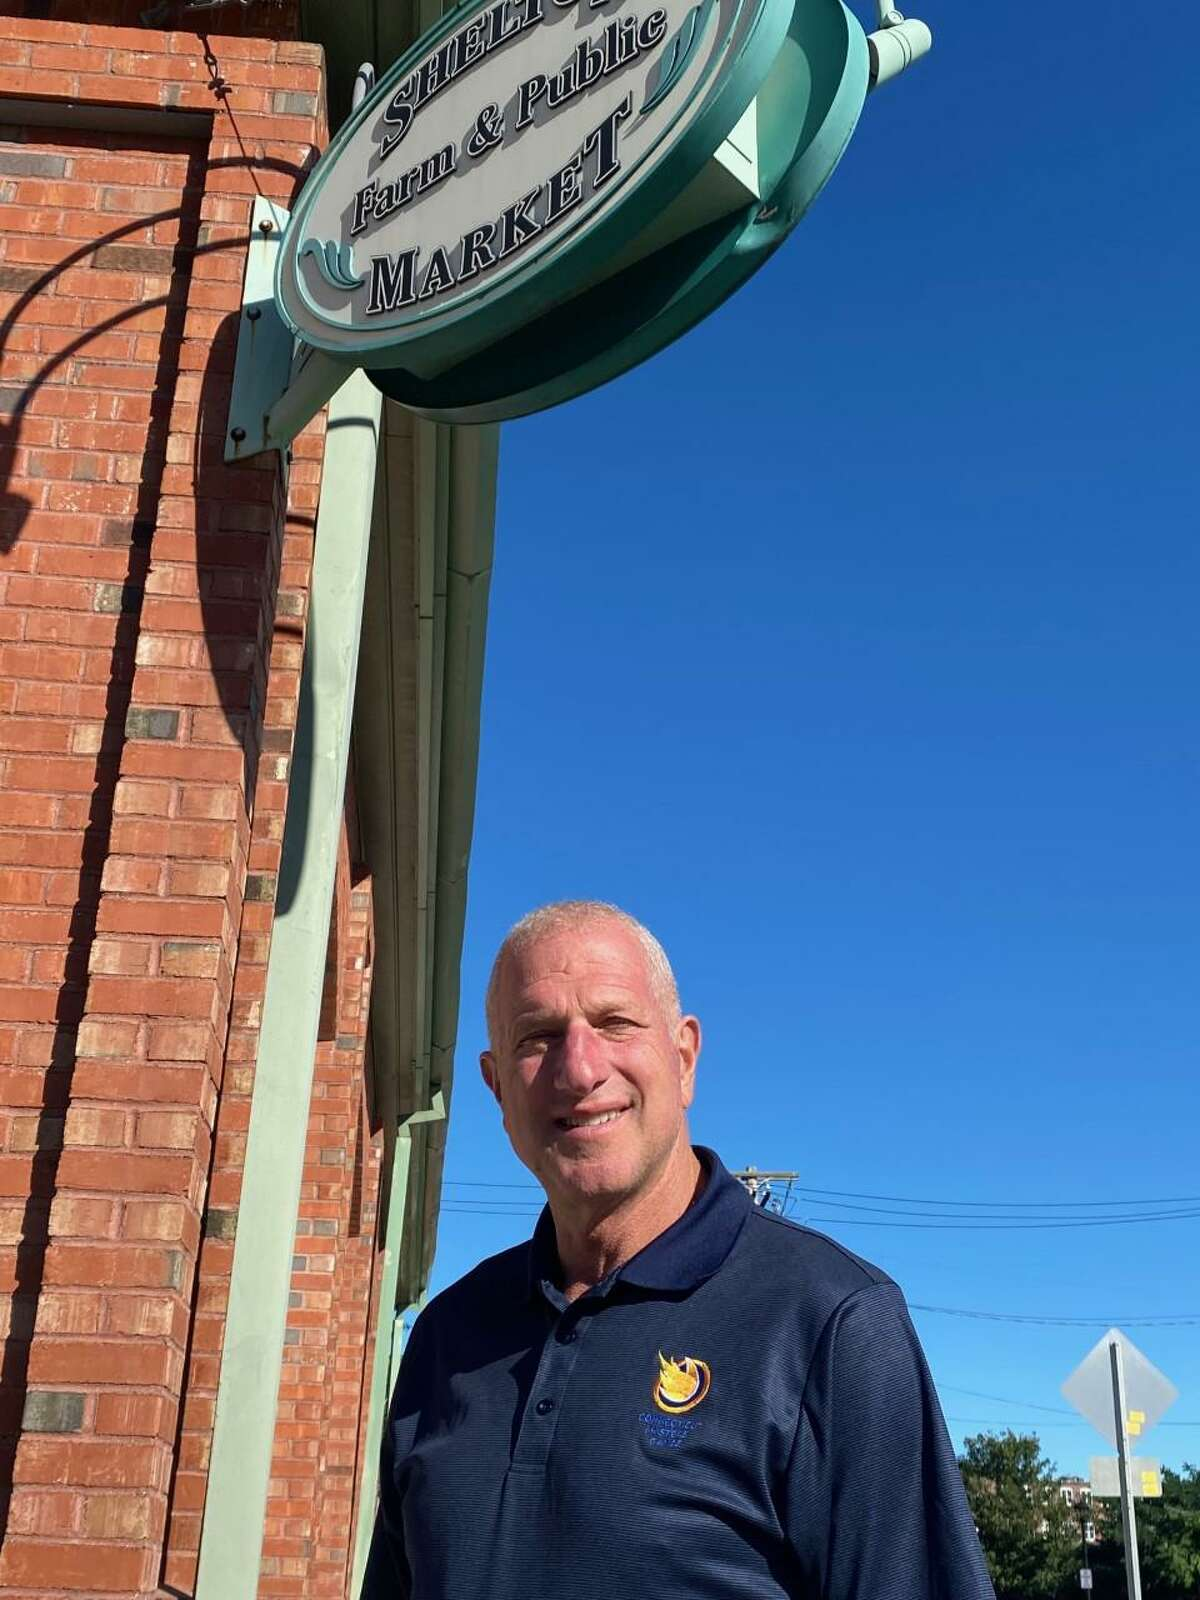 Mayor Mark Lauretti at the city's farmers market building.